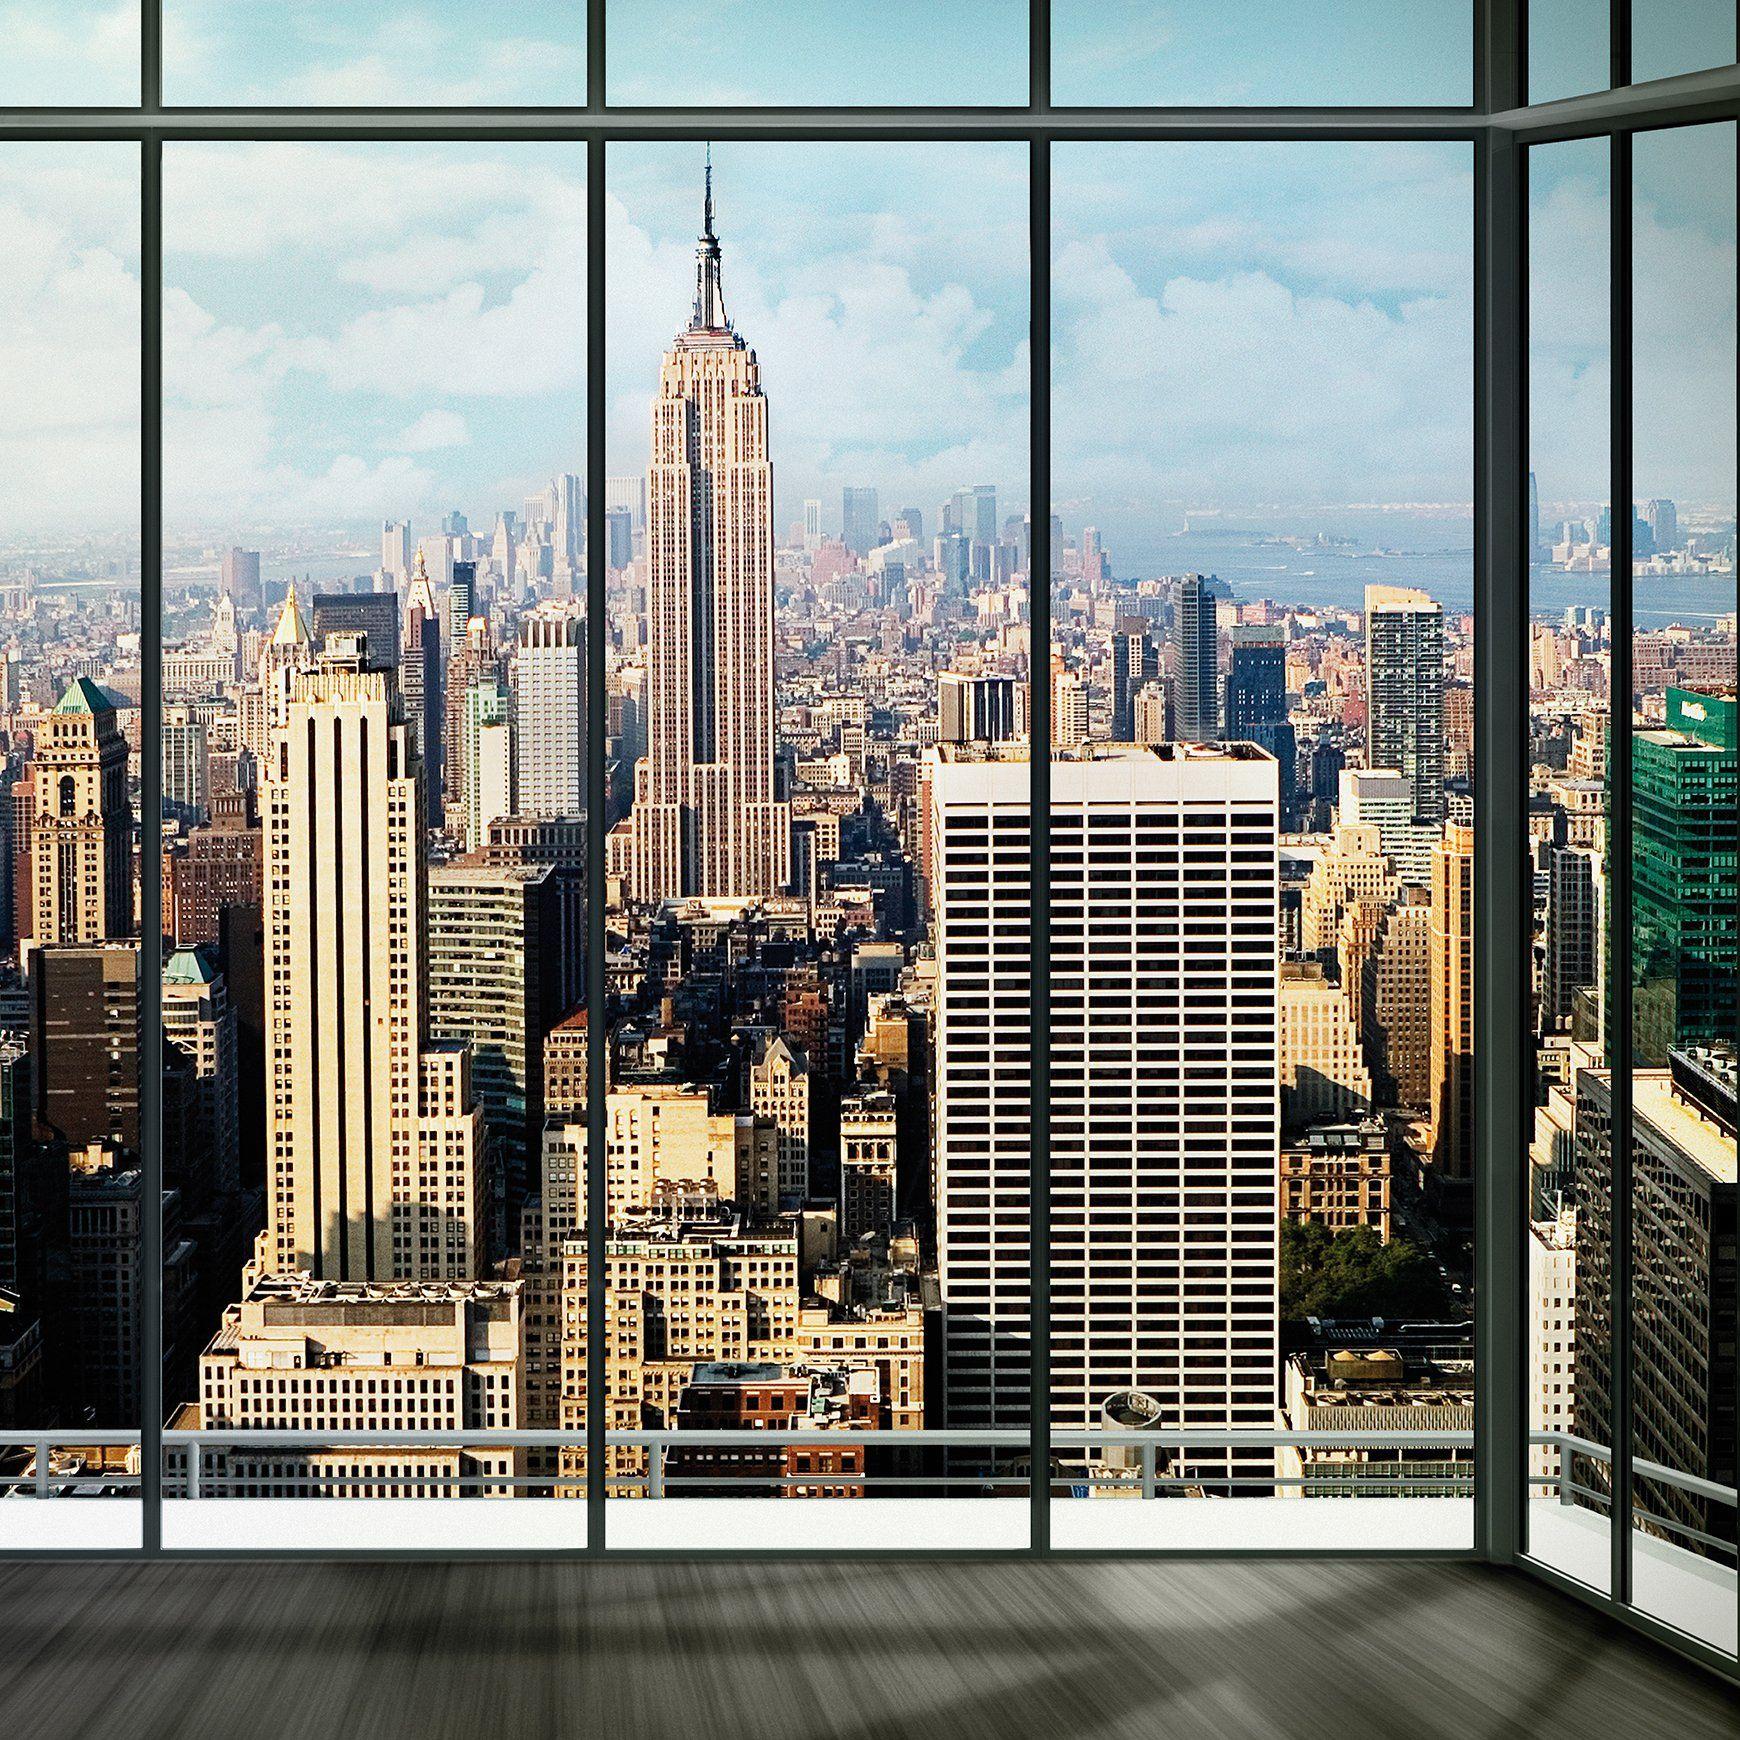 New York Skyline Window Mural 85 Window Mural New York Skyline Skyline